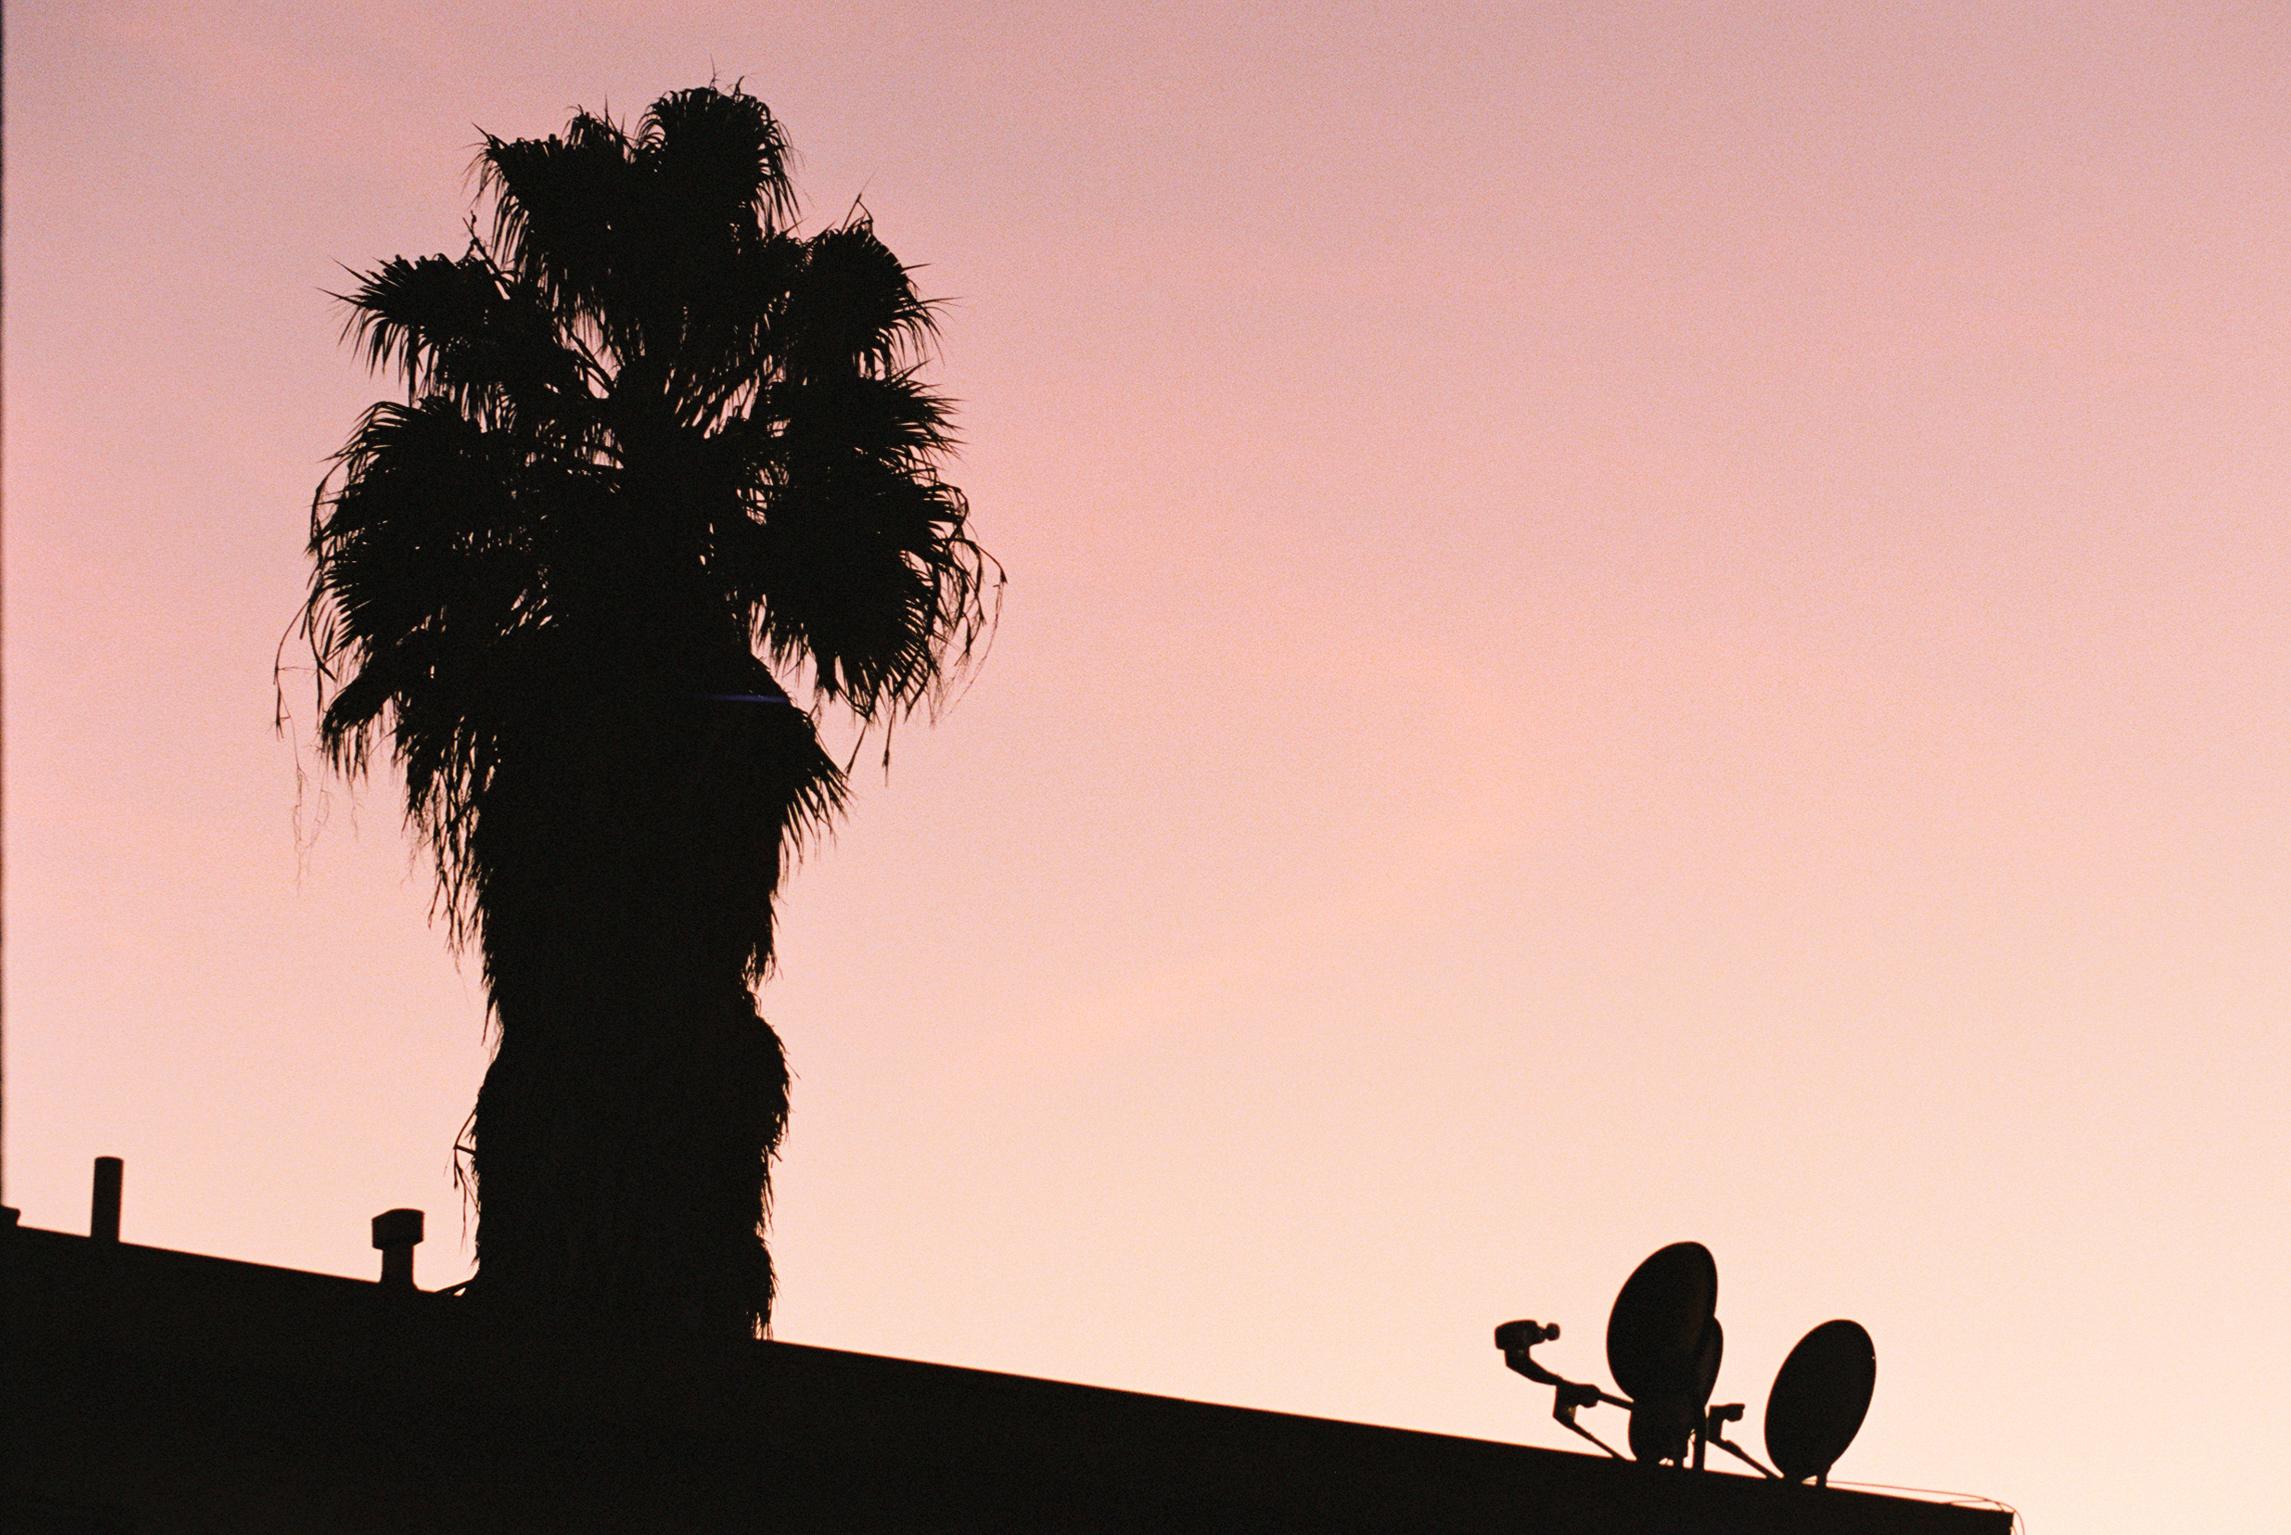 film_california_plants_2019_lind138-004.jpg